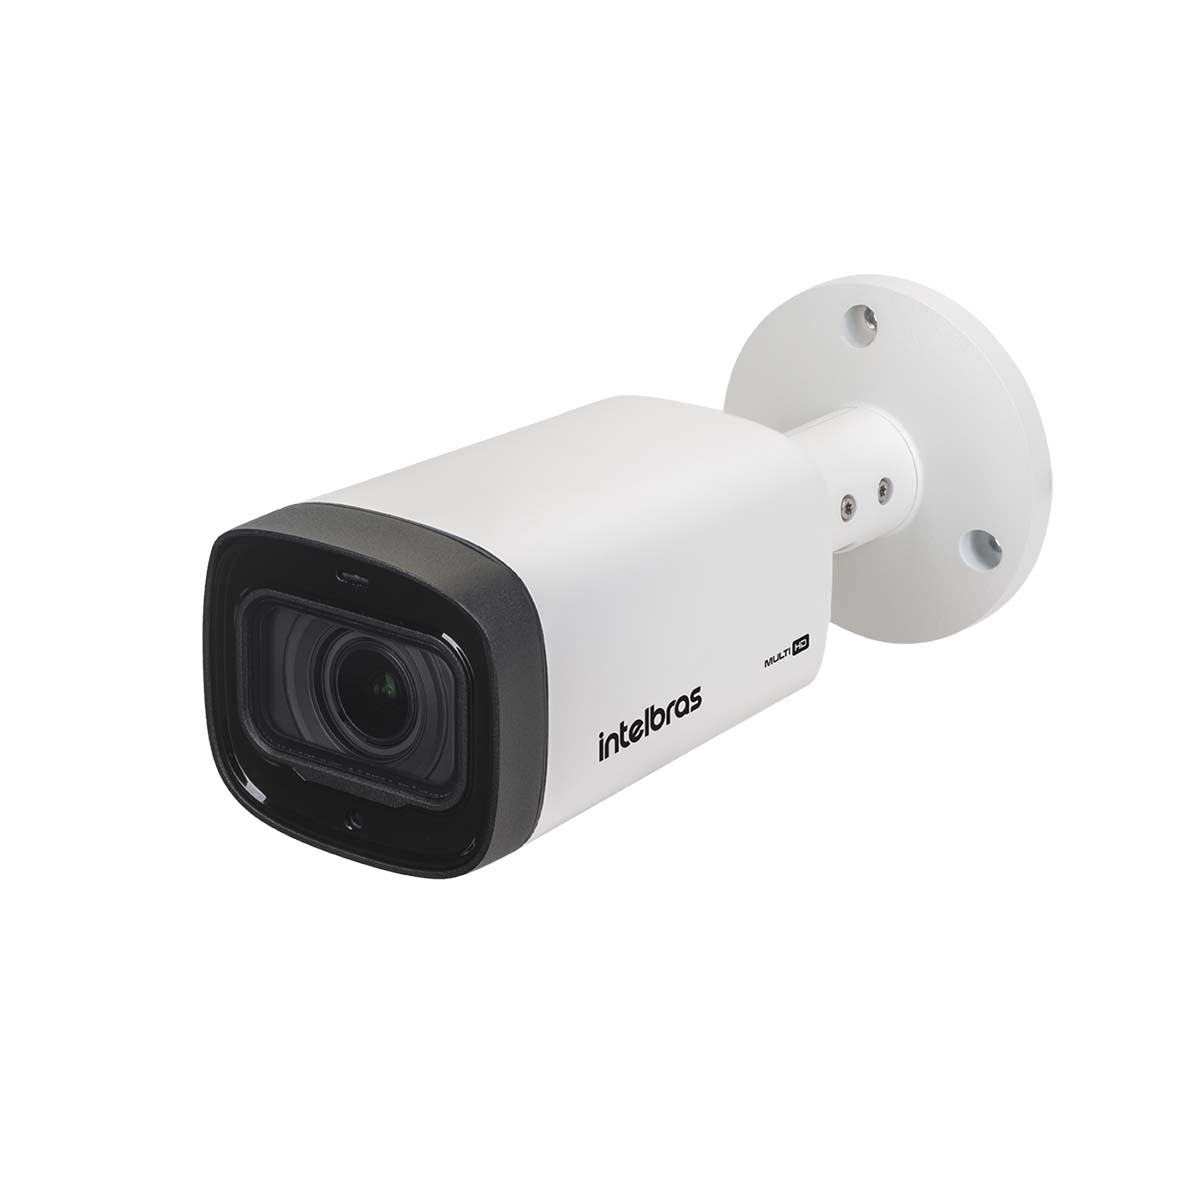 Kit 05 Câmera Intelbras Vhd 3240 Vf G6 1080p 2,7 A 12mm